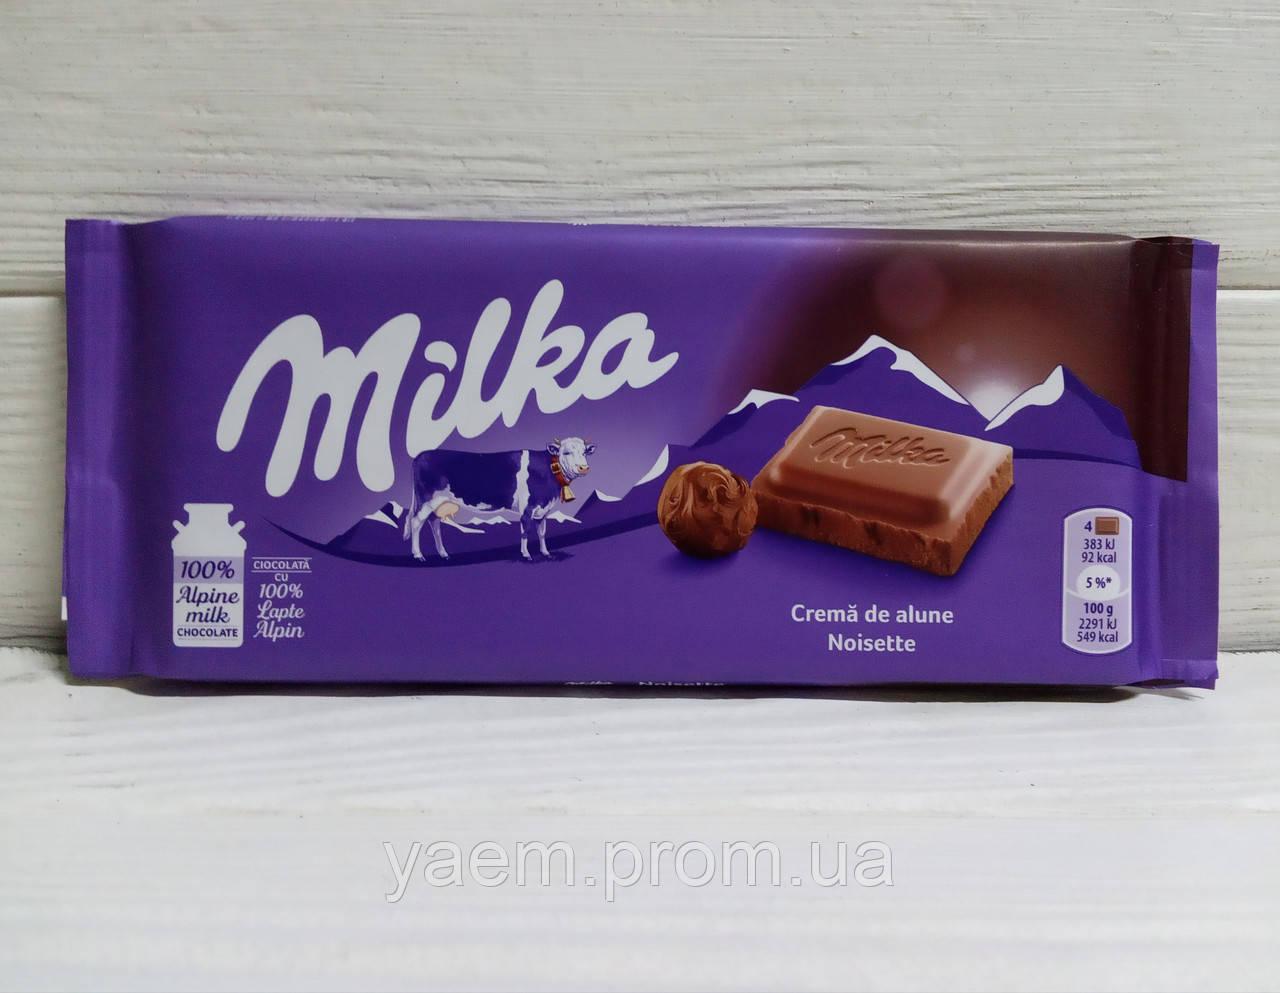 Шоколад Milka (Швейцария) Noisette